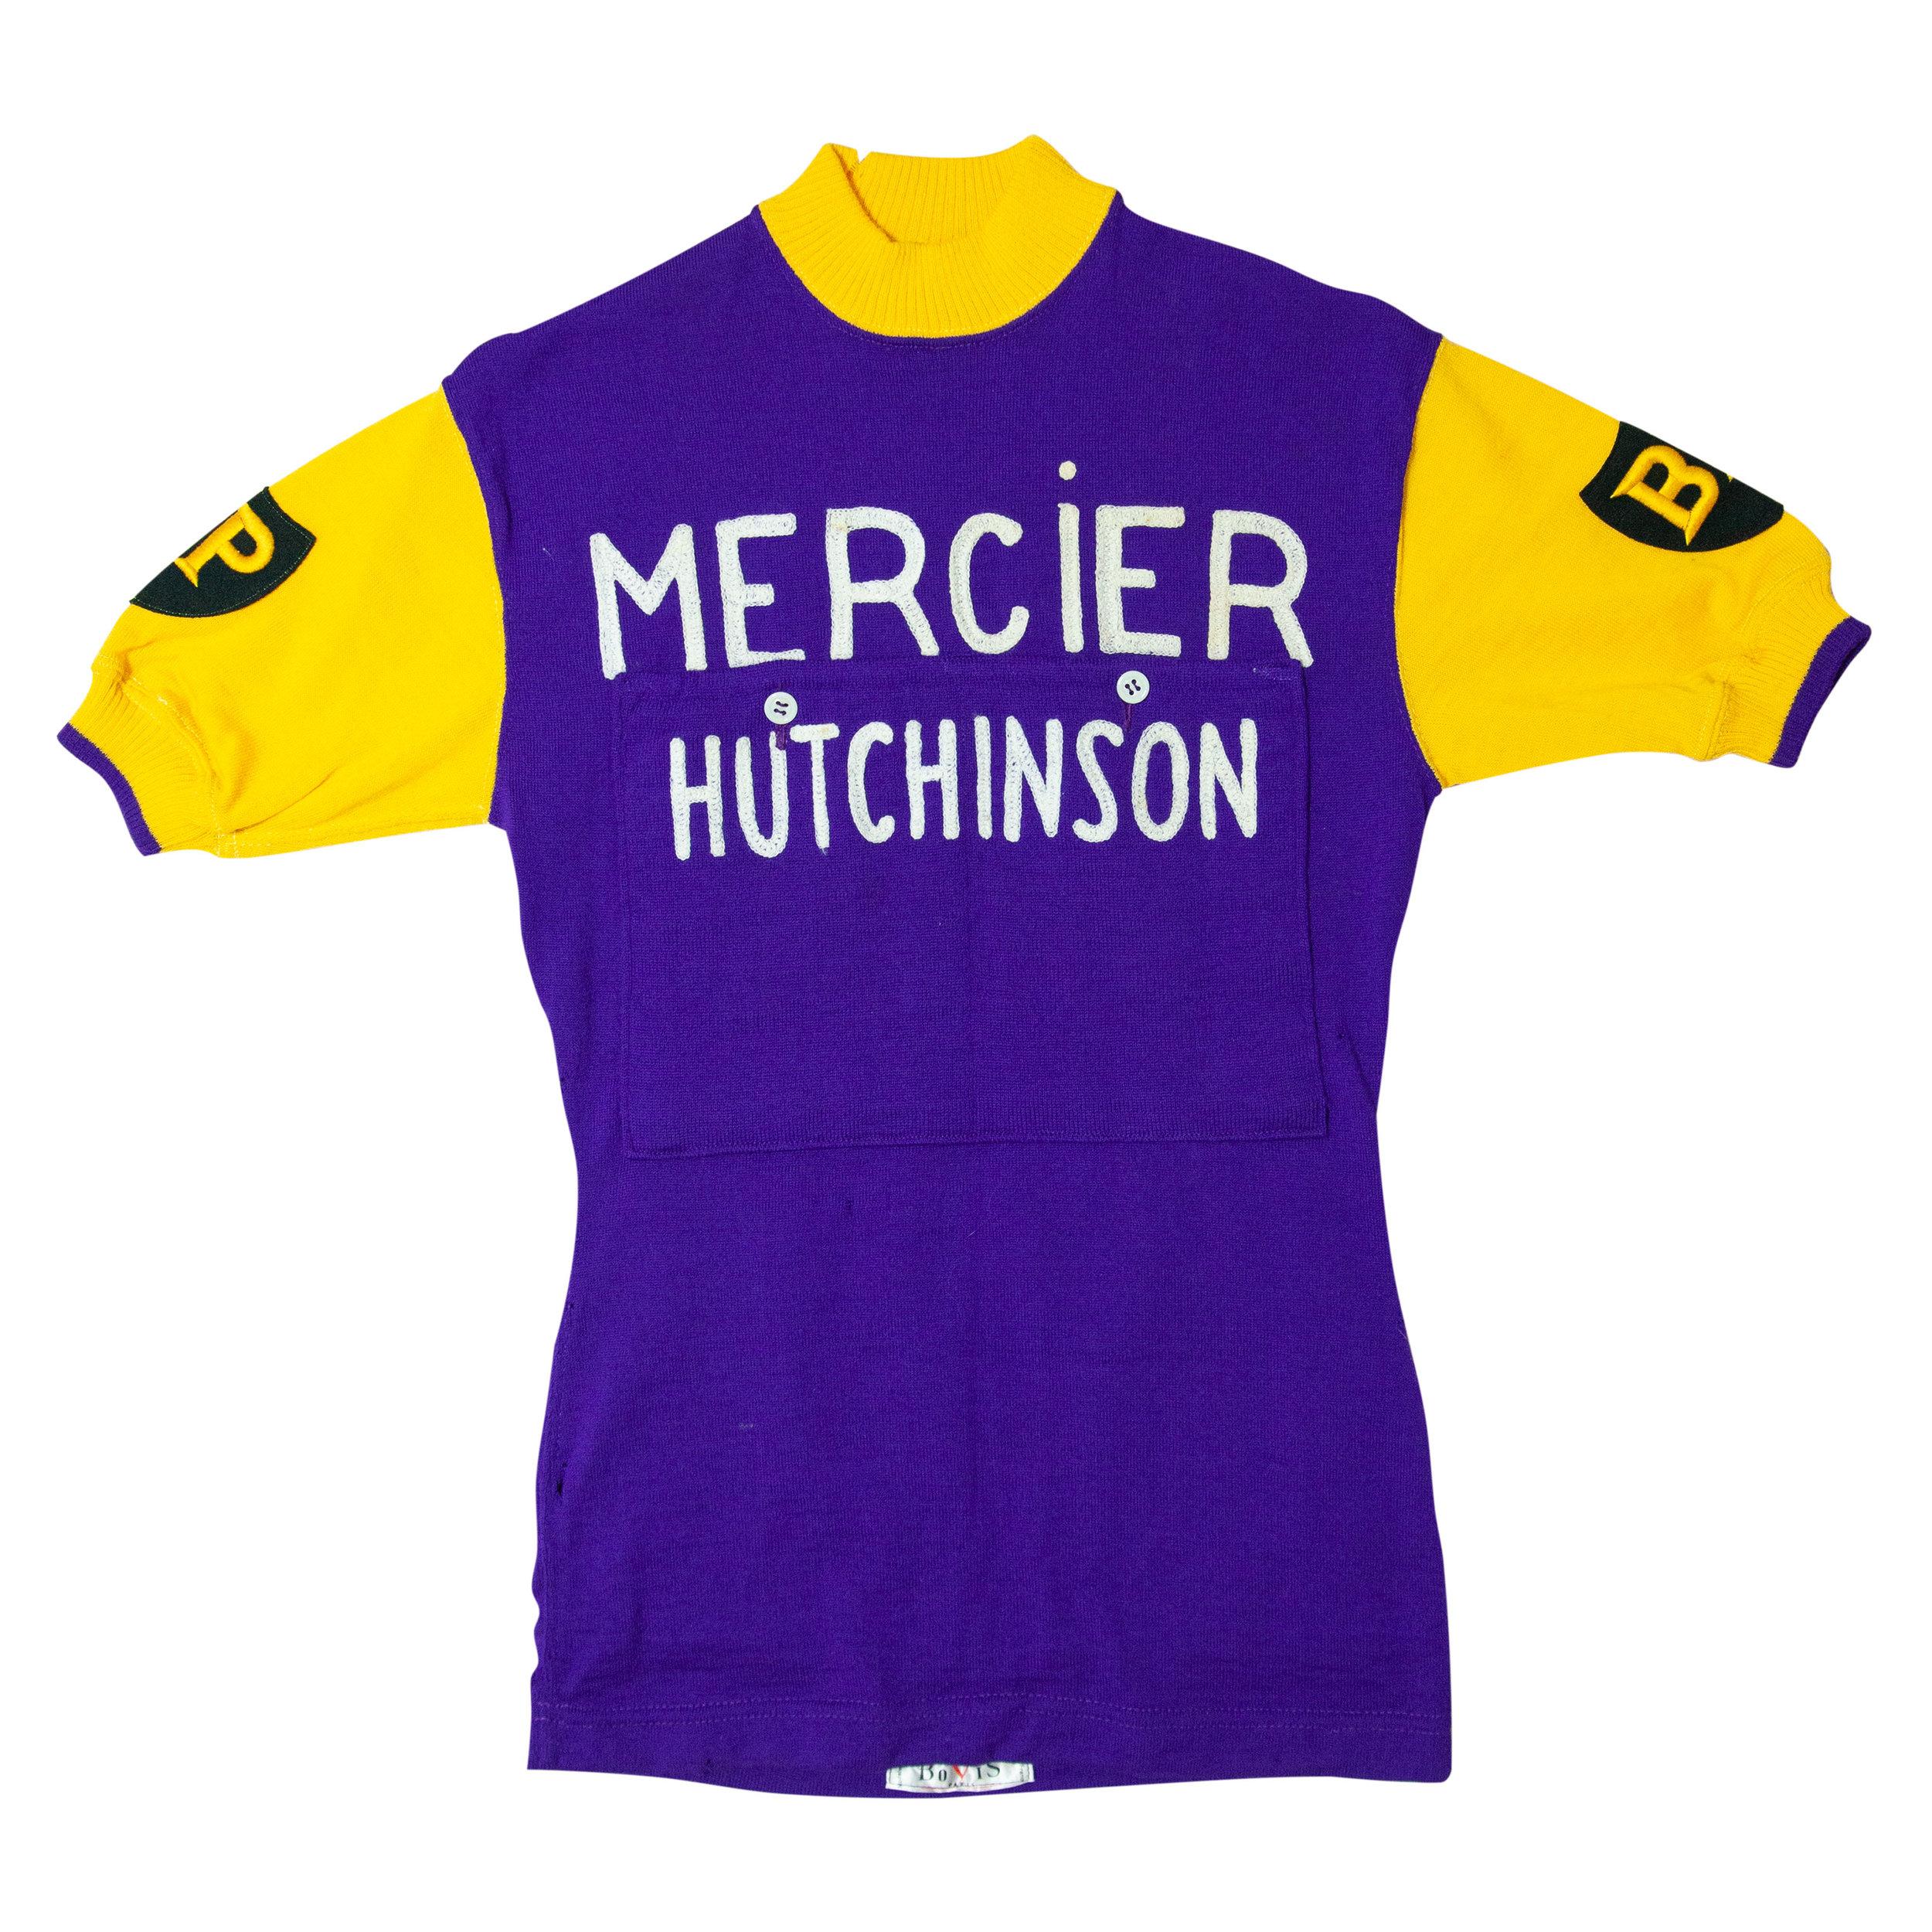 Mercier_Hutchinson.jpg